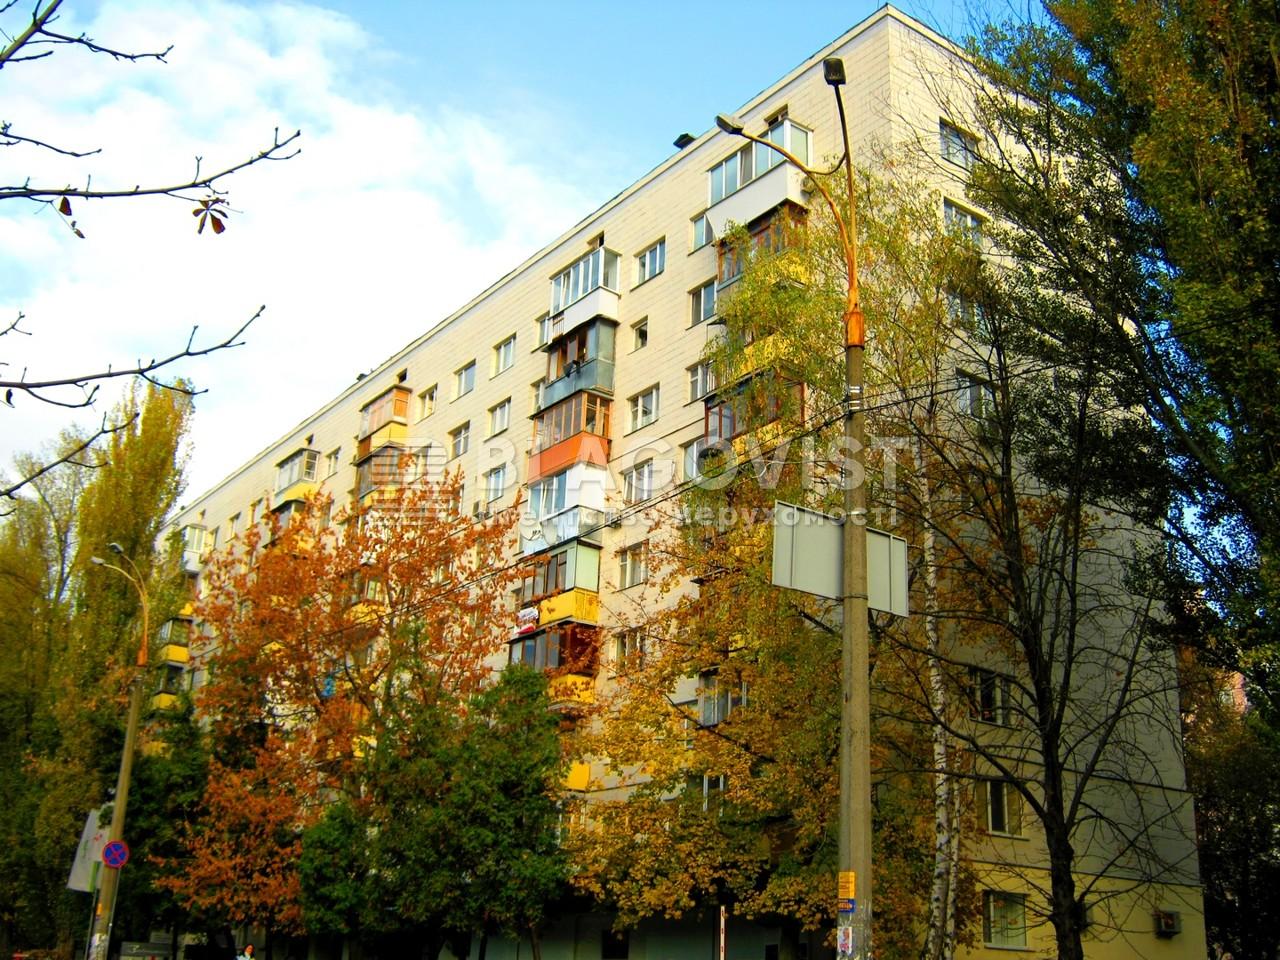 Квартира F-9454, Новогоспитальная (Щорса пер.), 5, Киев - Фото 1